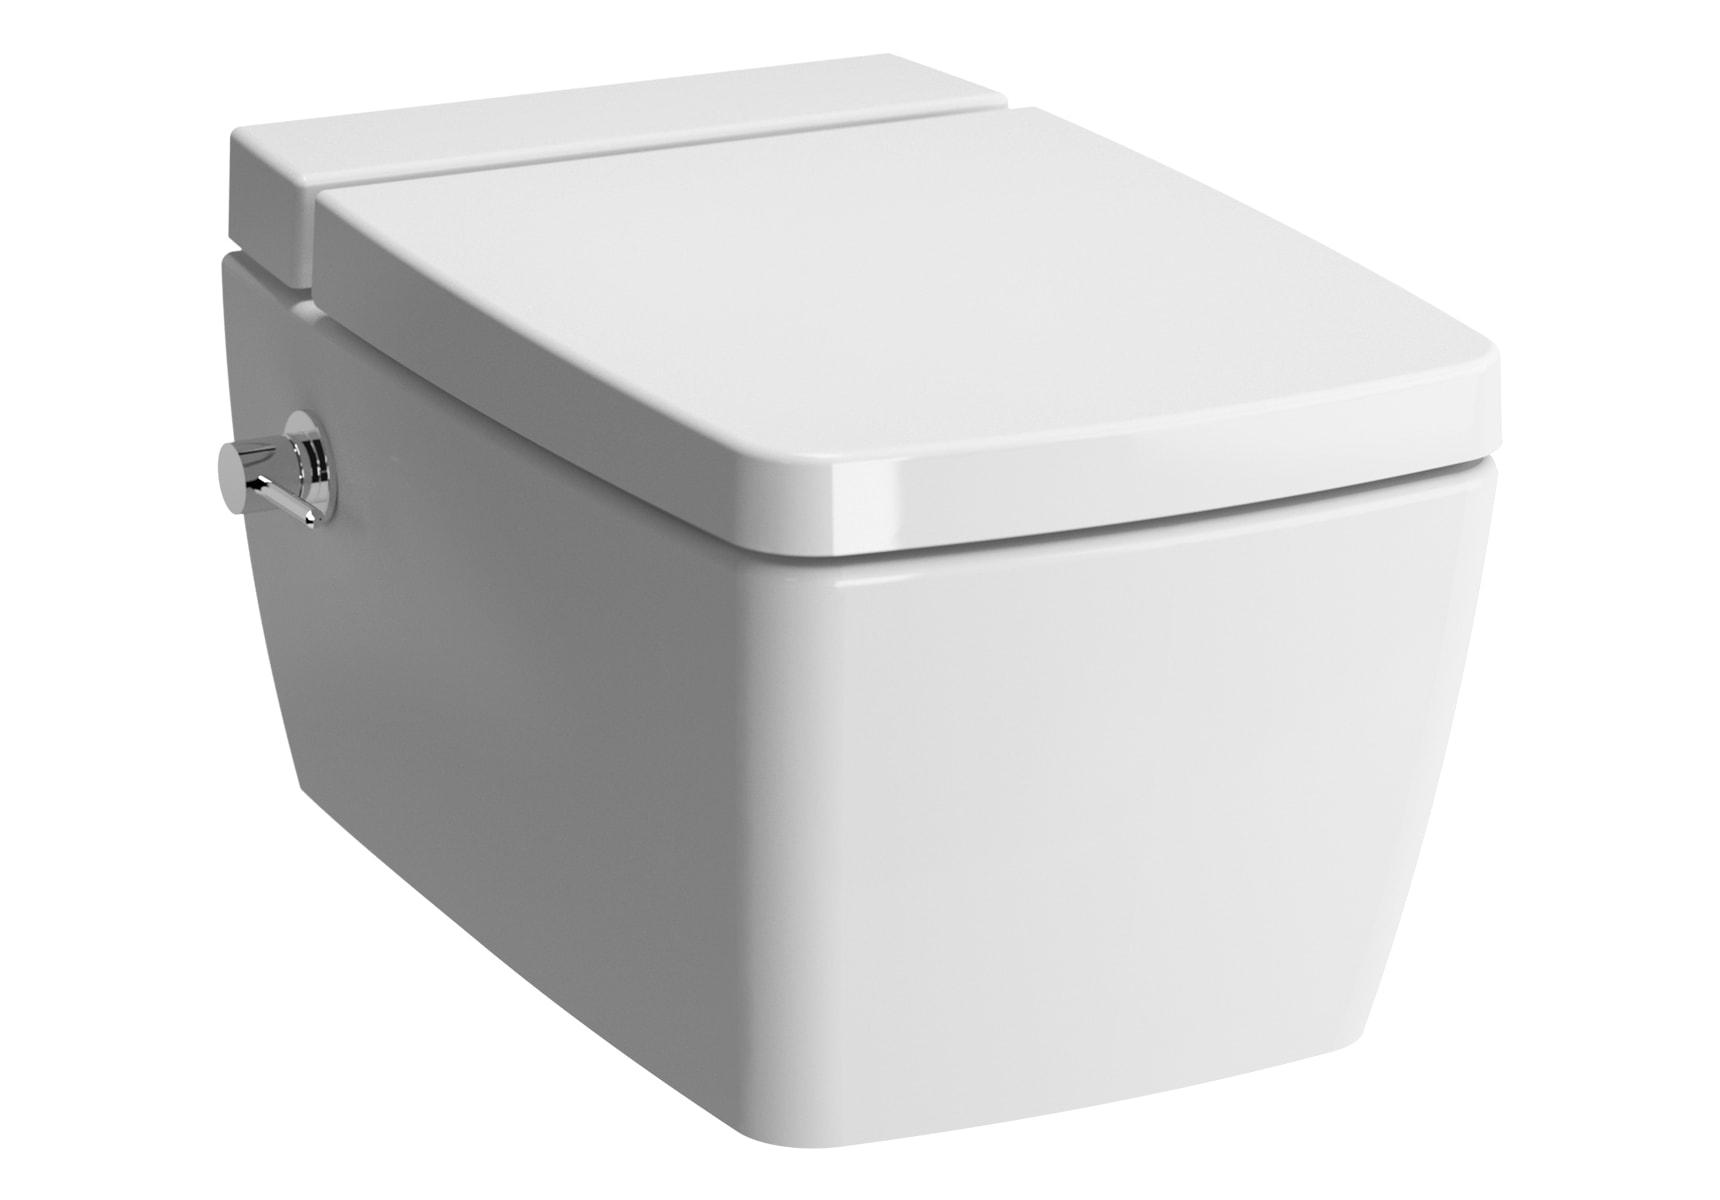 Metropole Rim-Ex Wall-Hung WC Pan